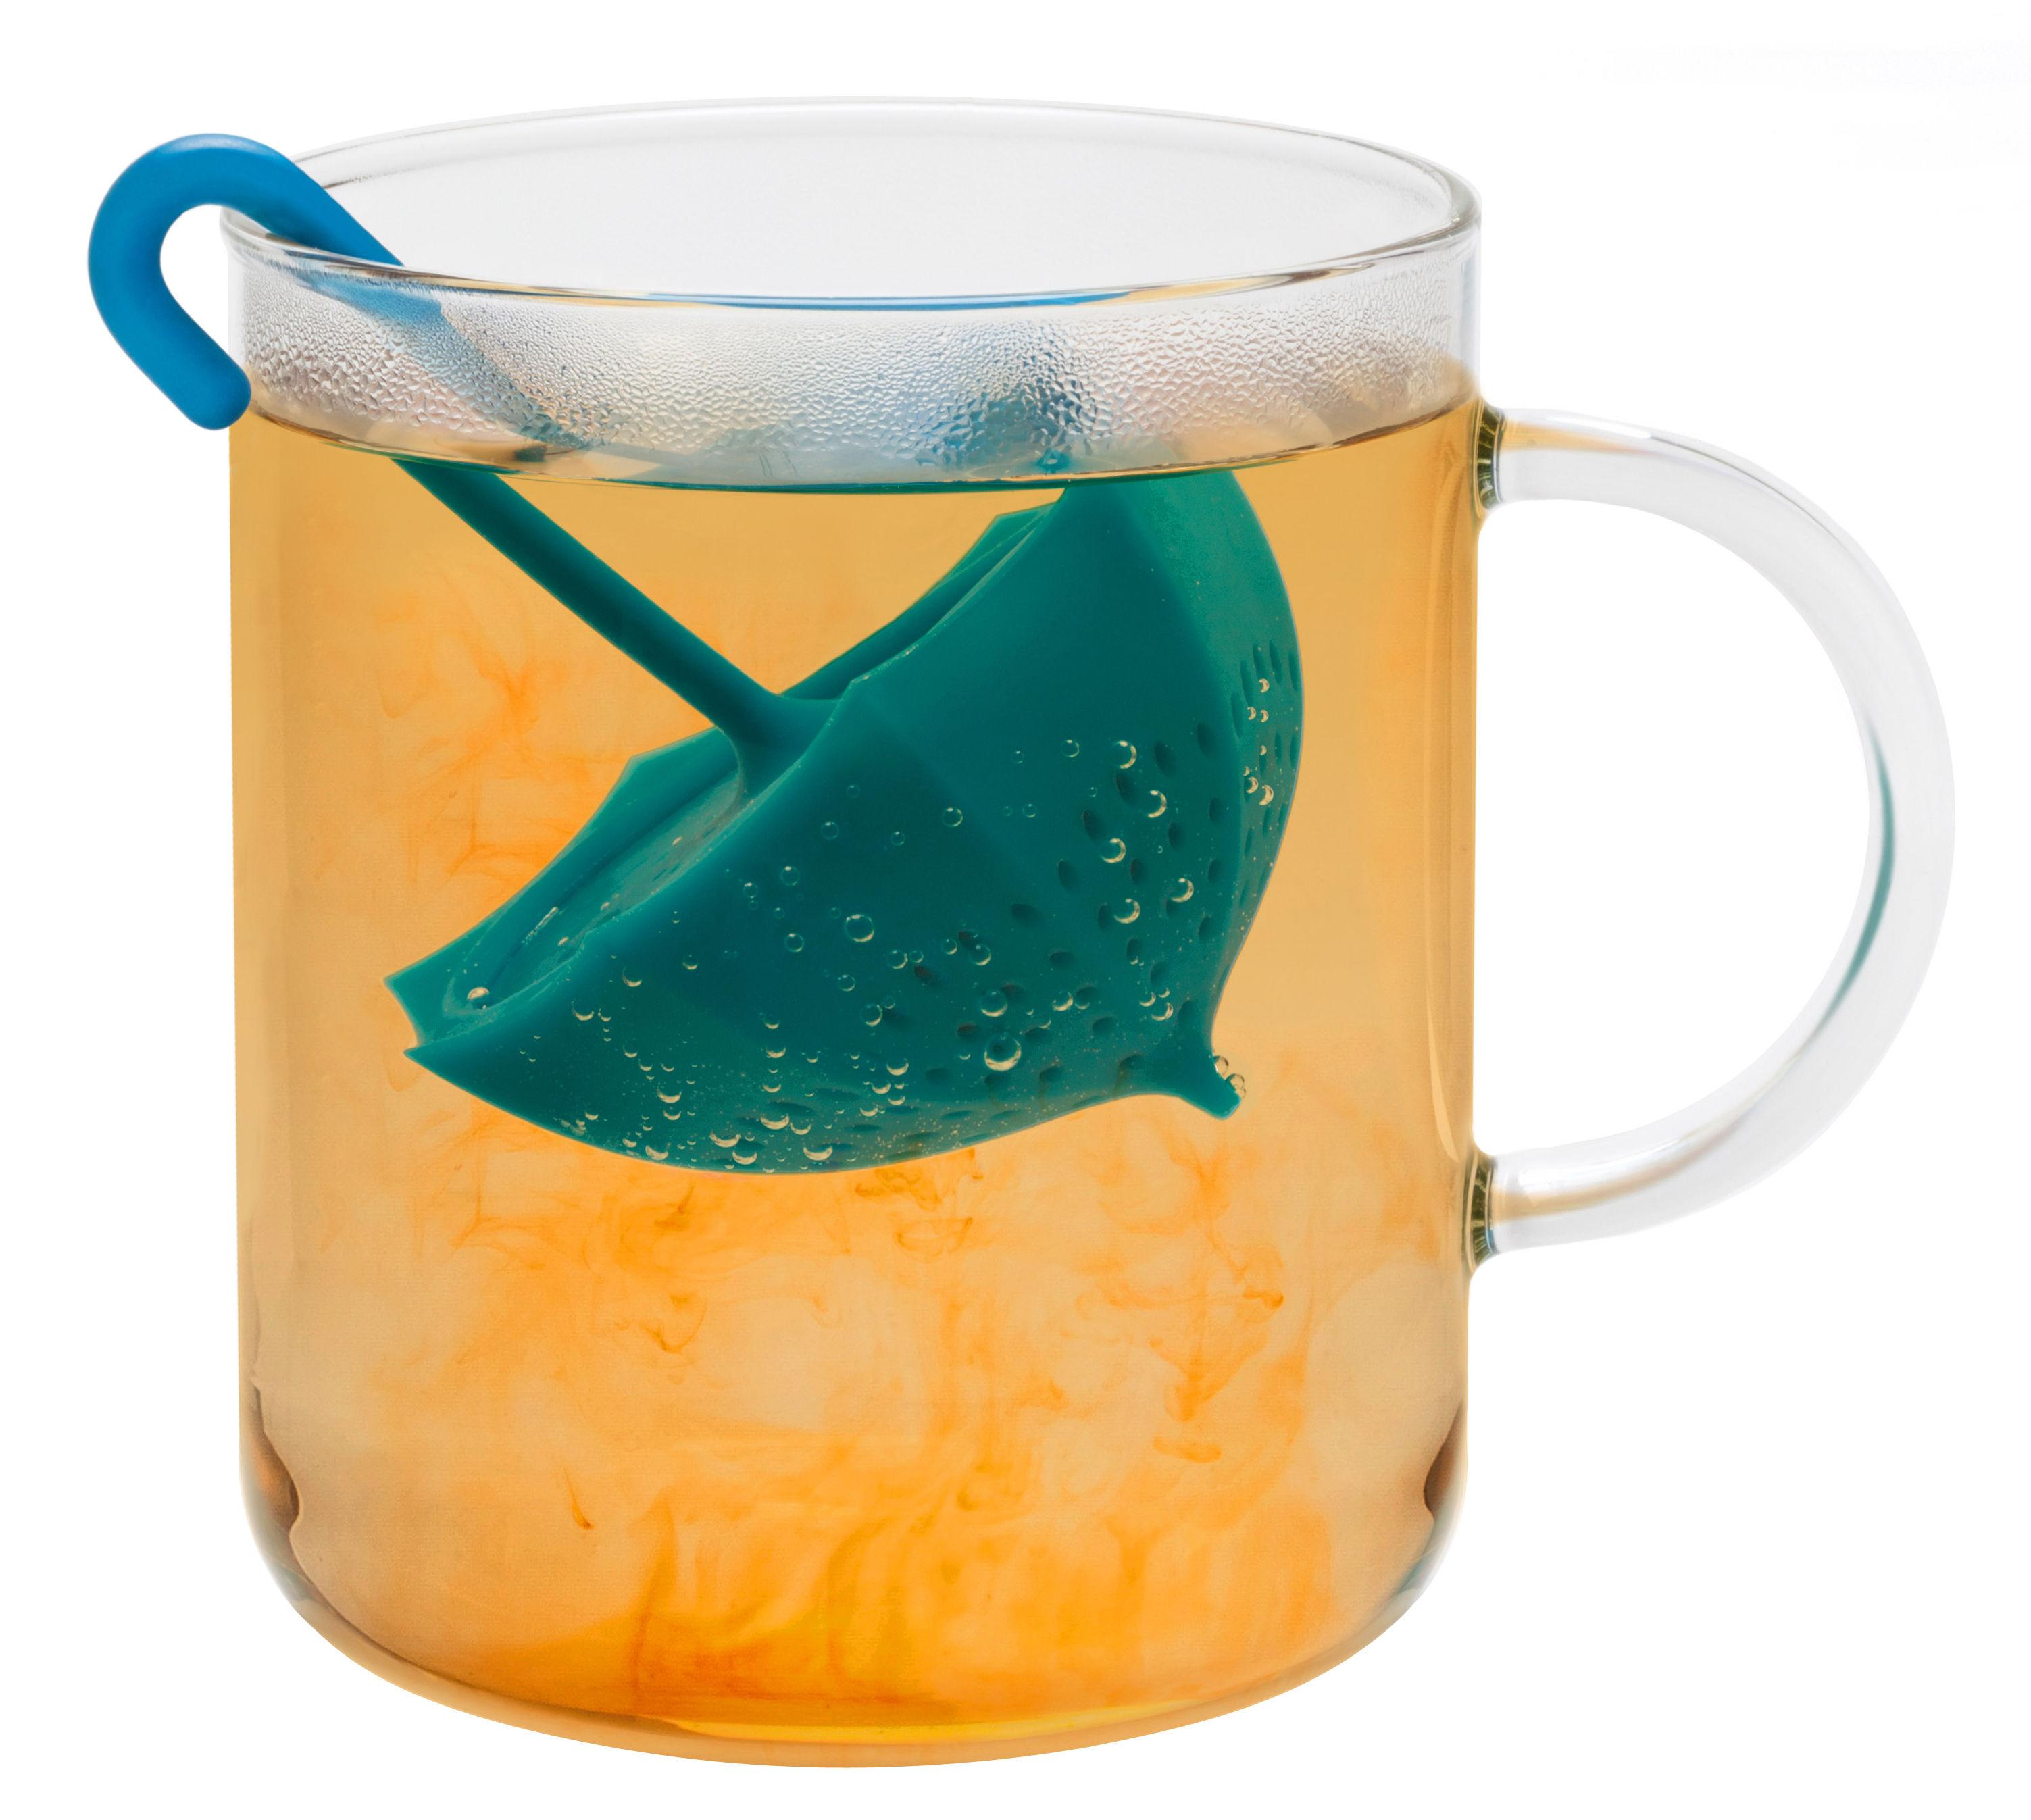 Tableware - Tea & Coffee Accessories - Umbrella Infuser by Pa Design - Blue - Flexible silicone